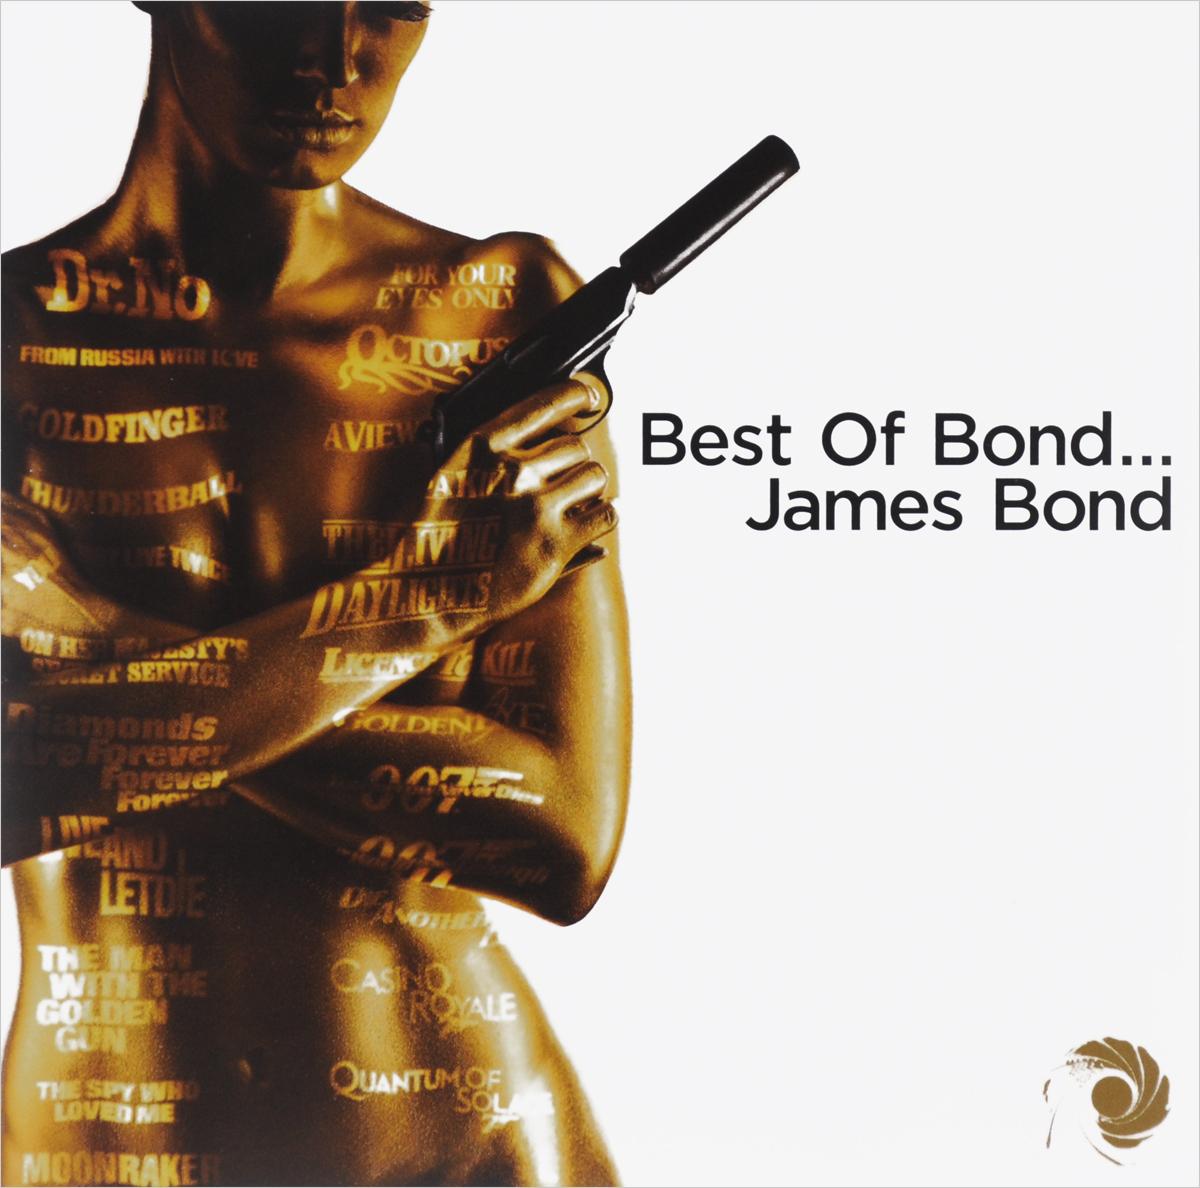 Best Of Bond... James Bond bond by design the art of the james bond films